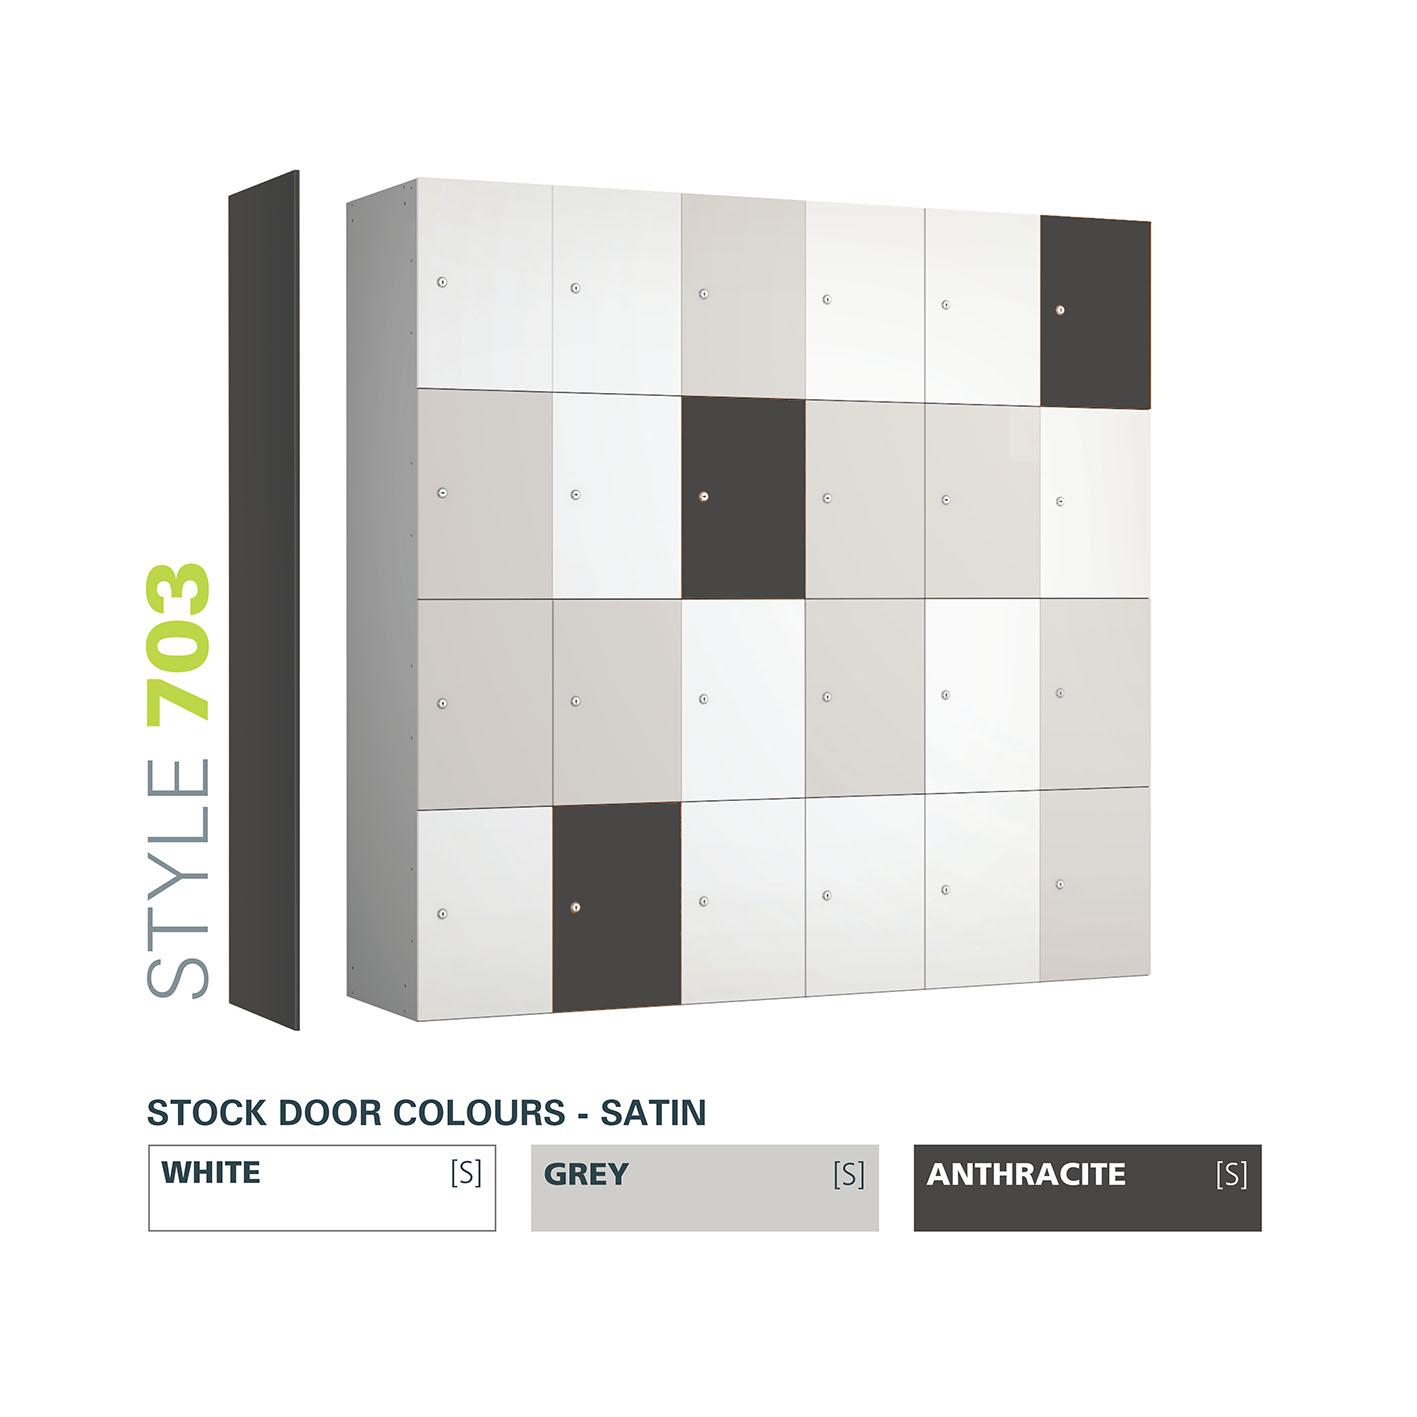 Probe buzzbox colours style 703